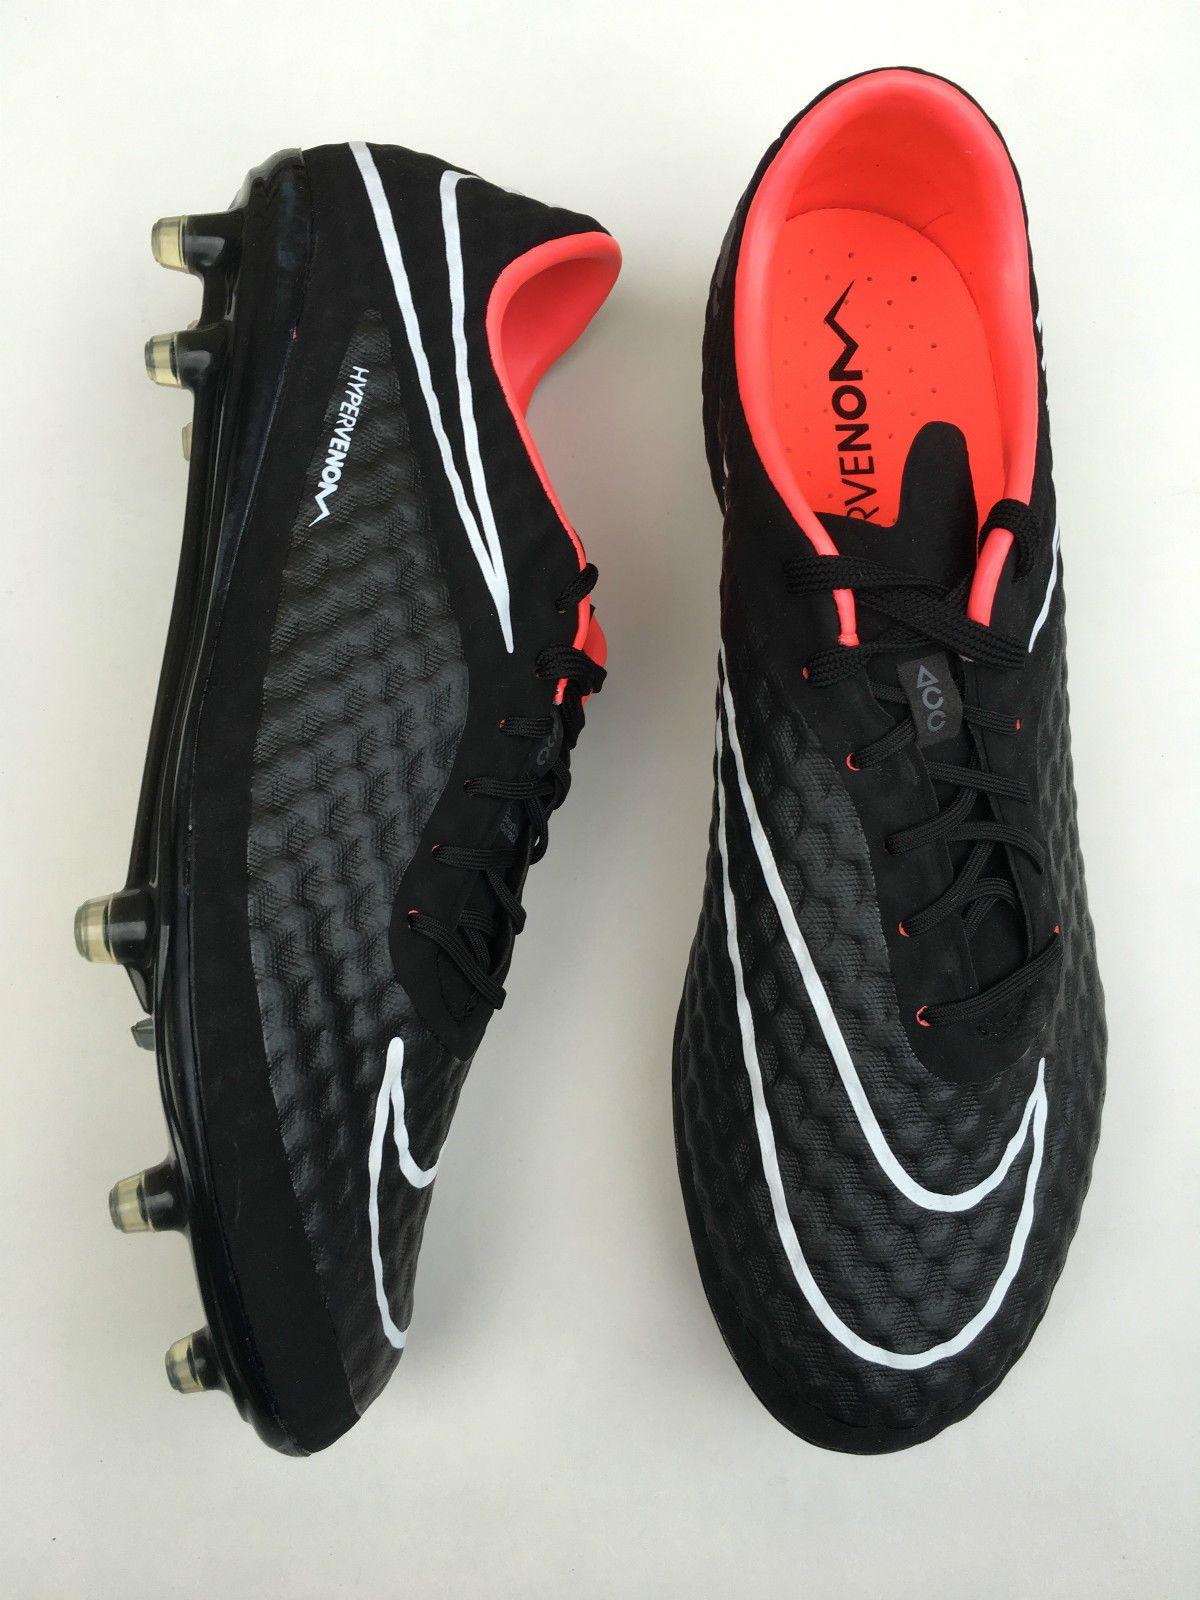 online store 36592 e52e3 ... new zealand nike hypervenom phantom fg neymar jr authentic soccer  cleats blackout 599843 016 d896b 1c3da